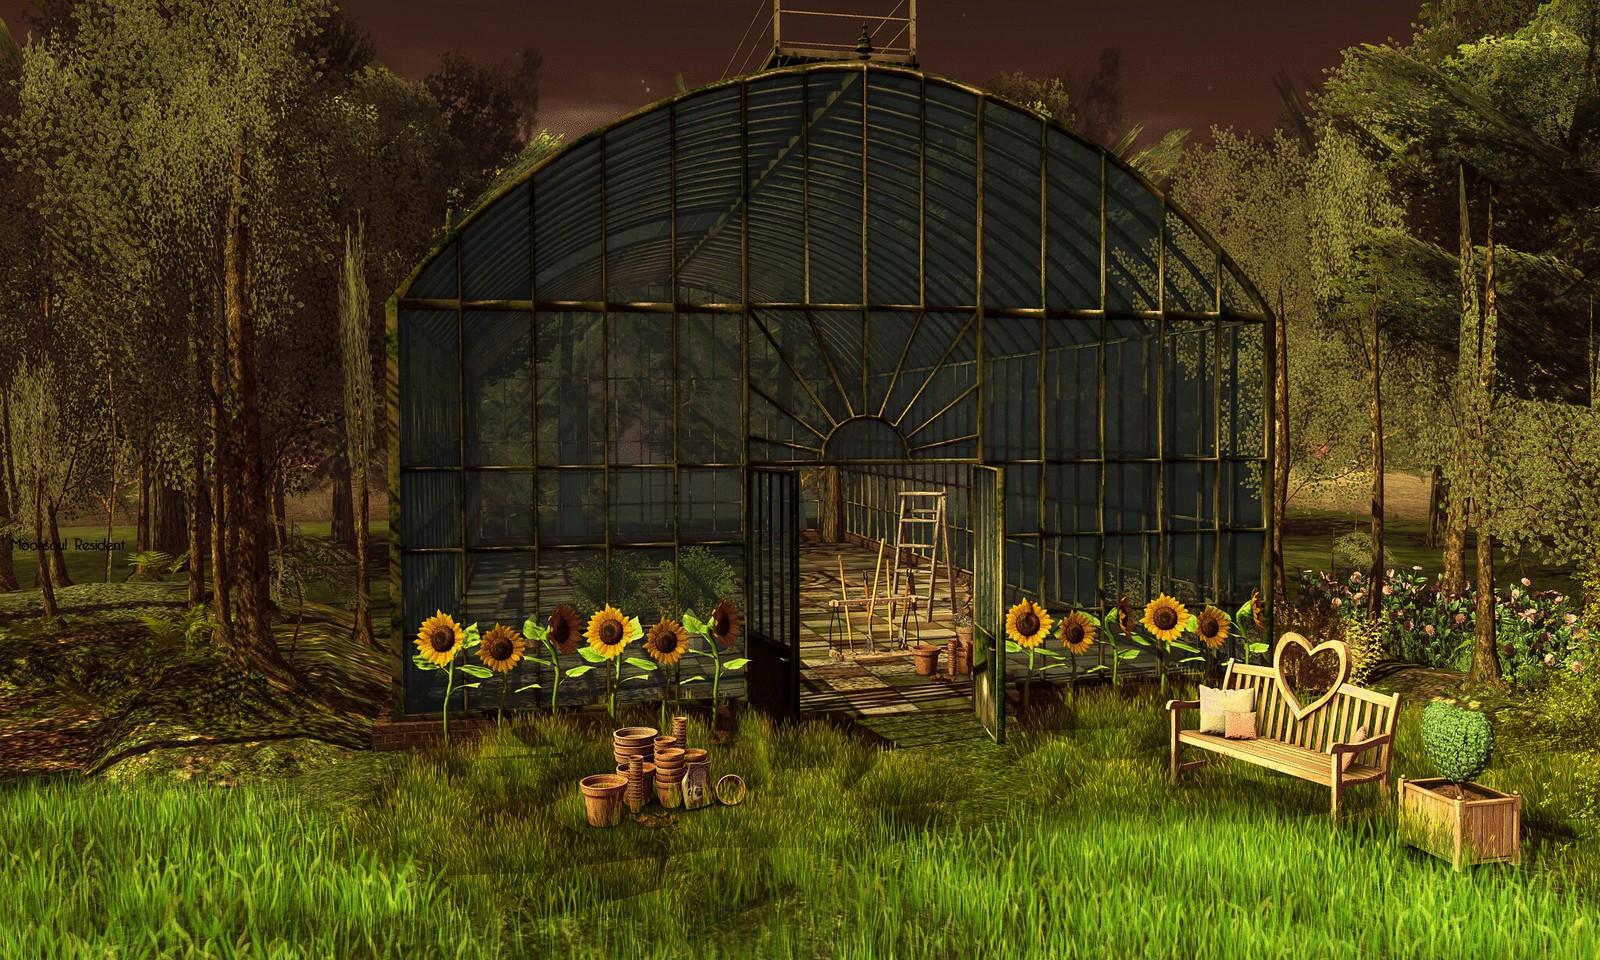 Antique Greenhouse